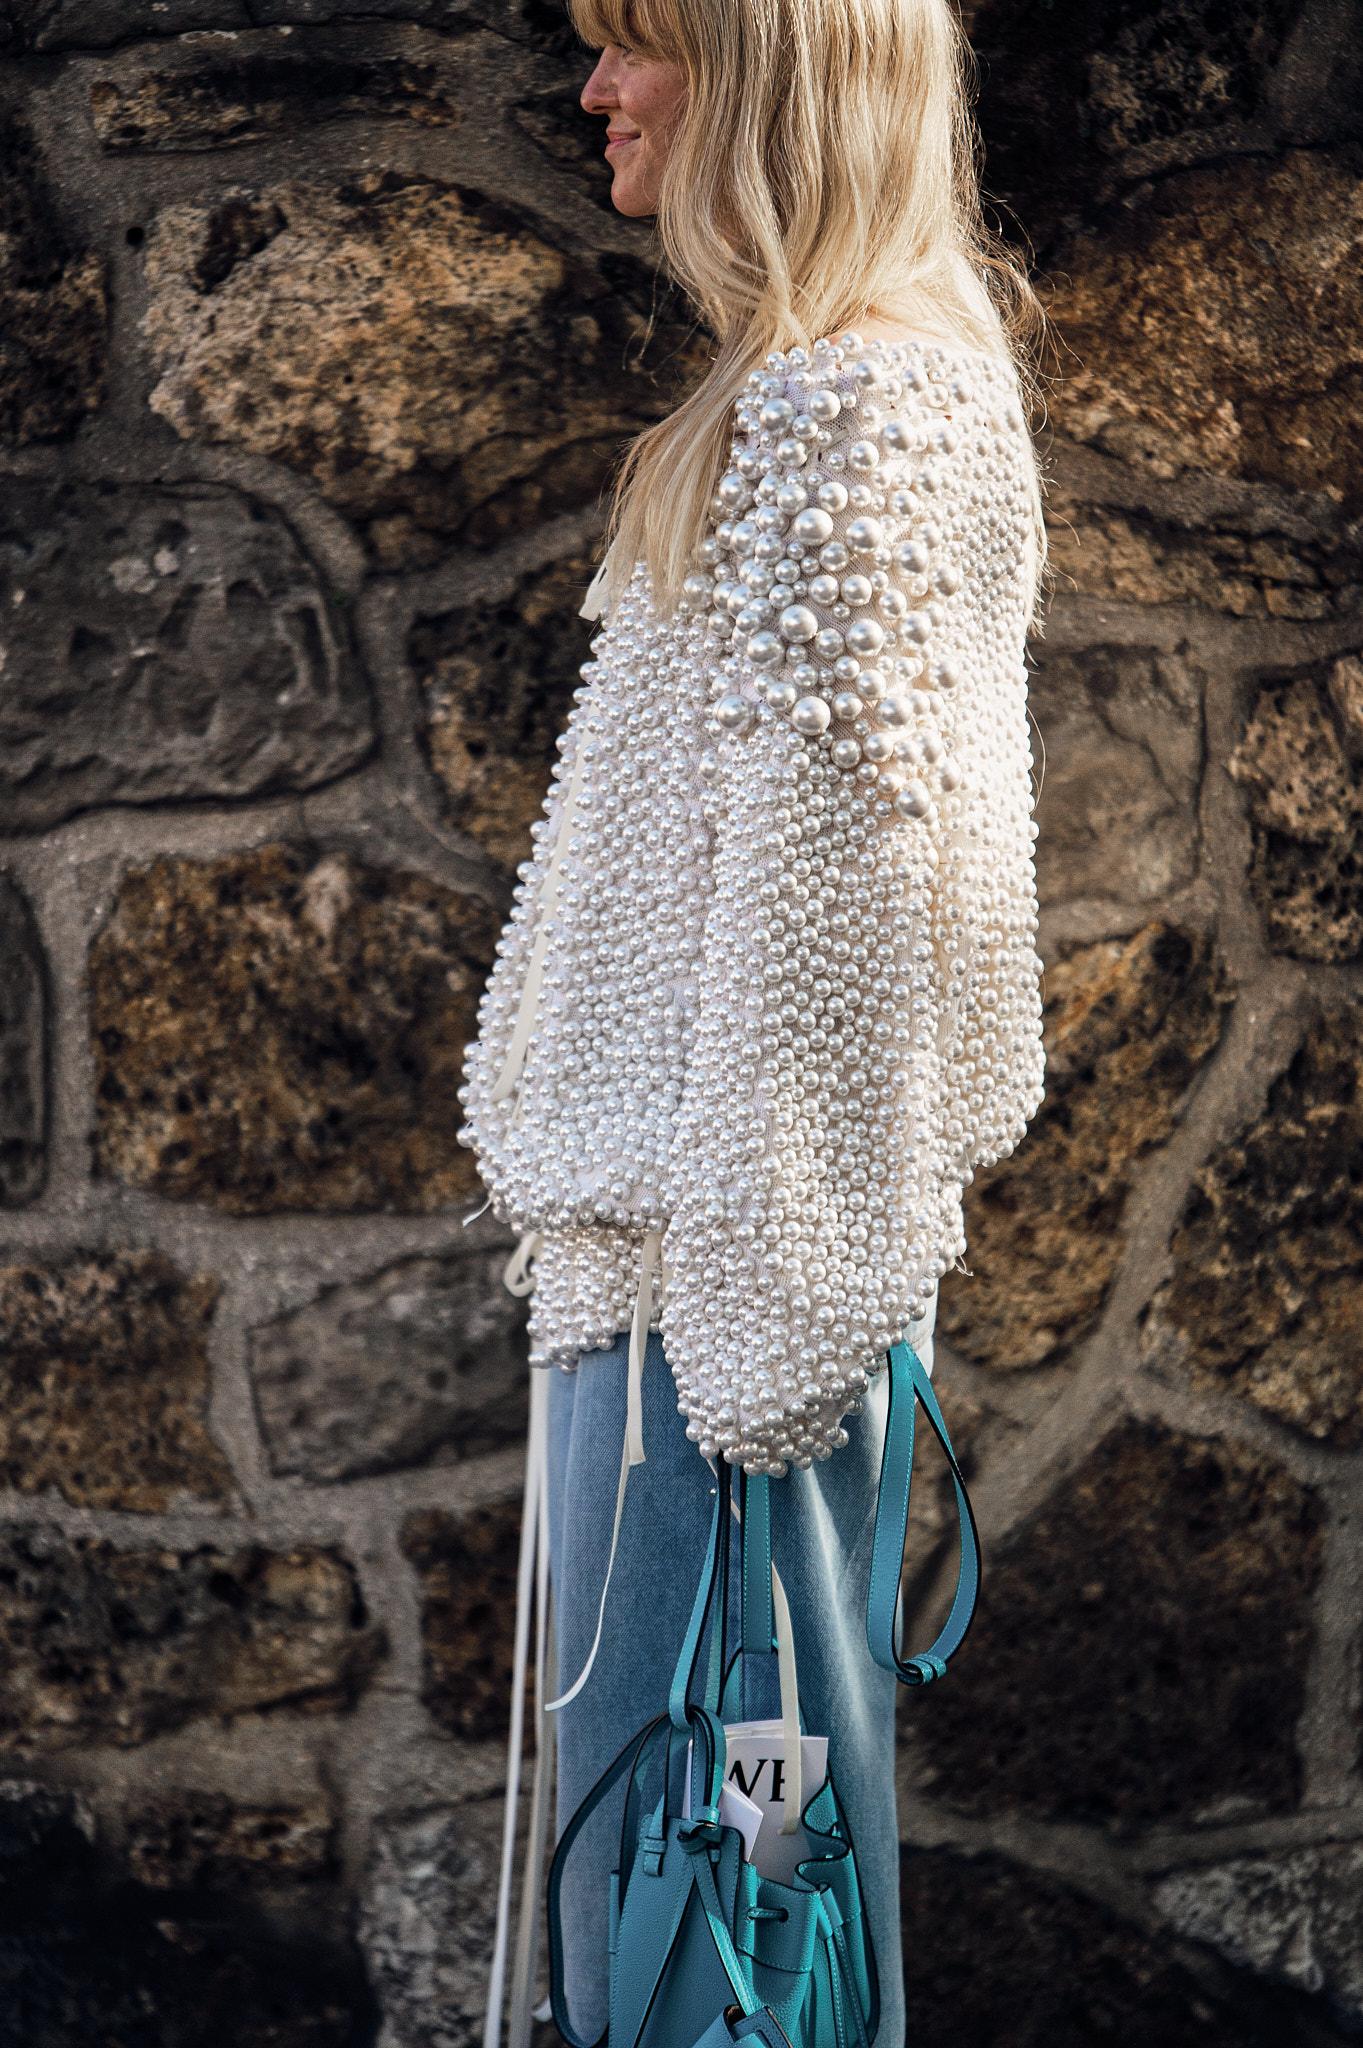 Jeanette Madsen - Outside Loewe - Paris Fashion Week SS20